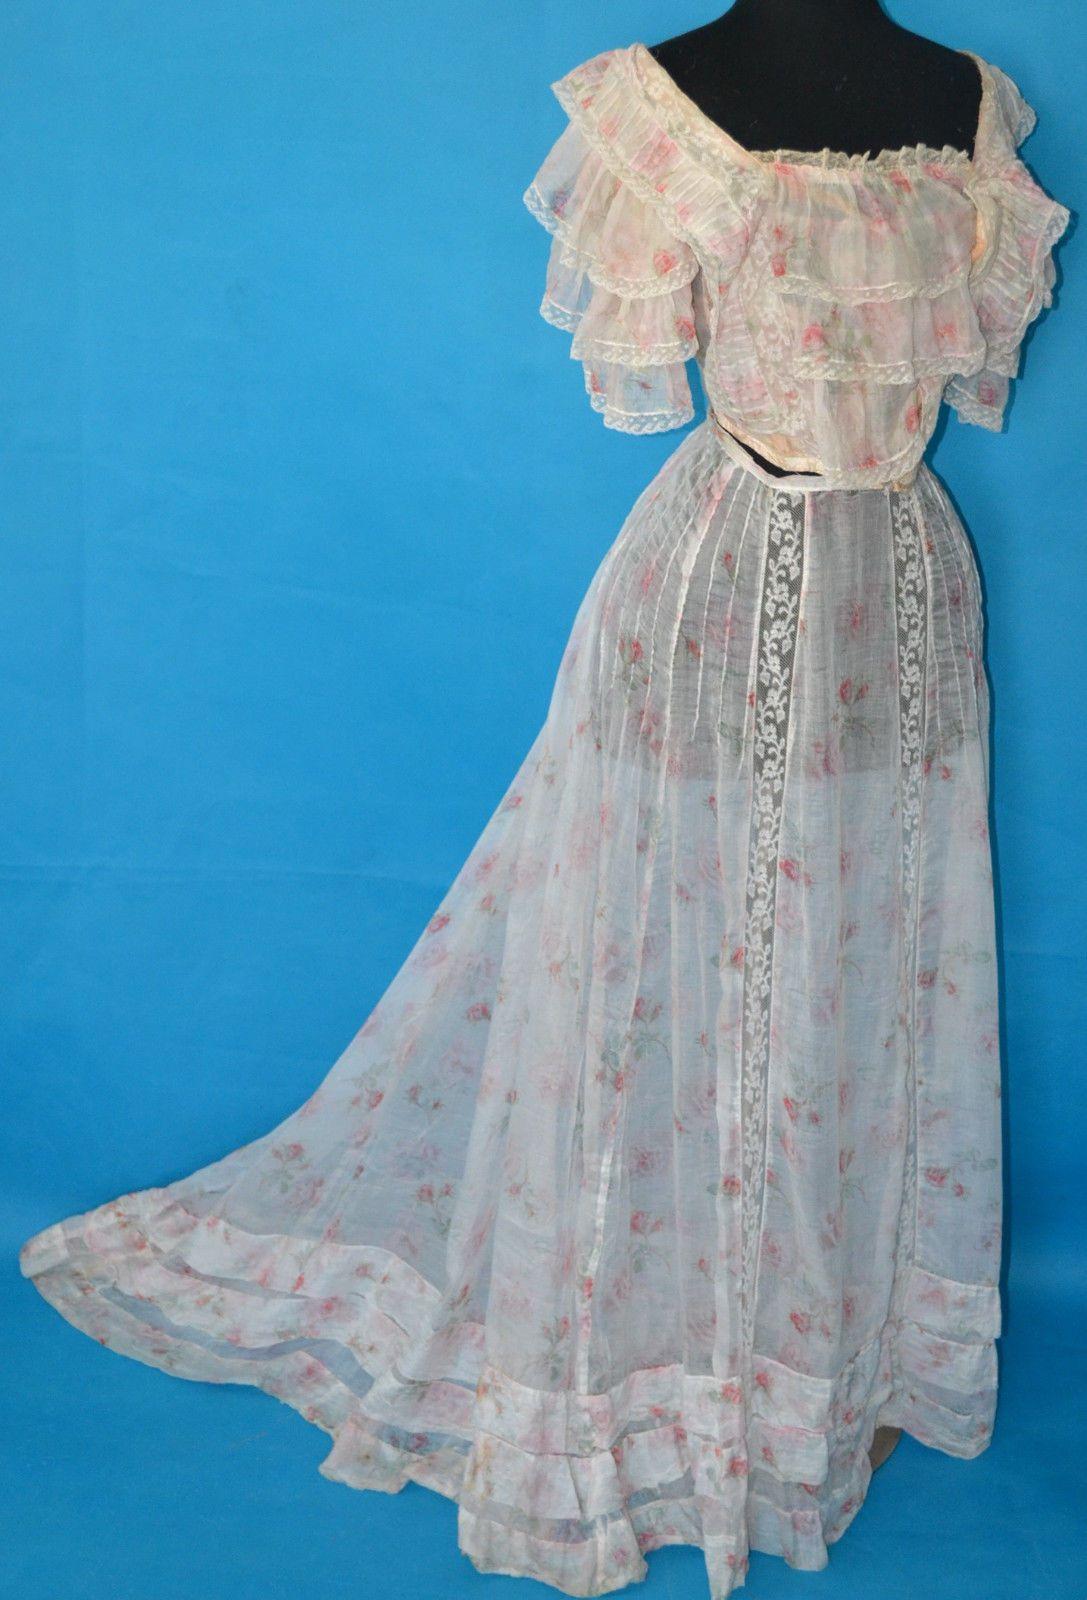 Most Romantic Antique 1900's Victorian Cabbage Rose Lace Bustle Dress Old Corset | eBay